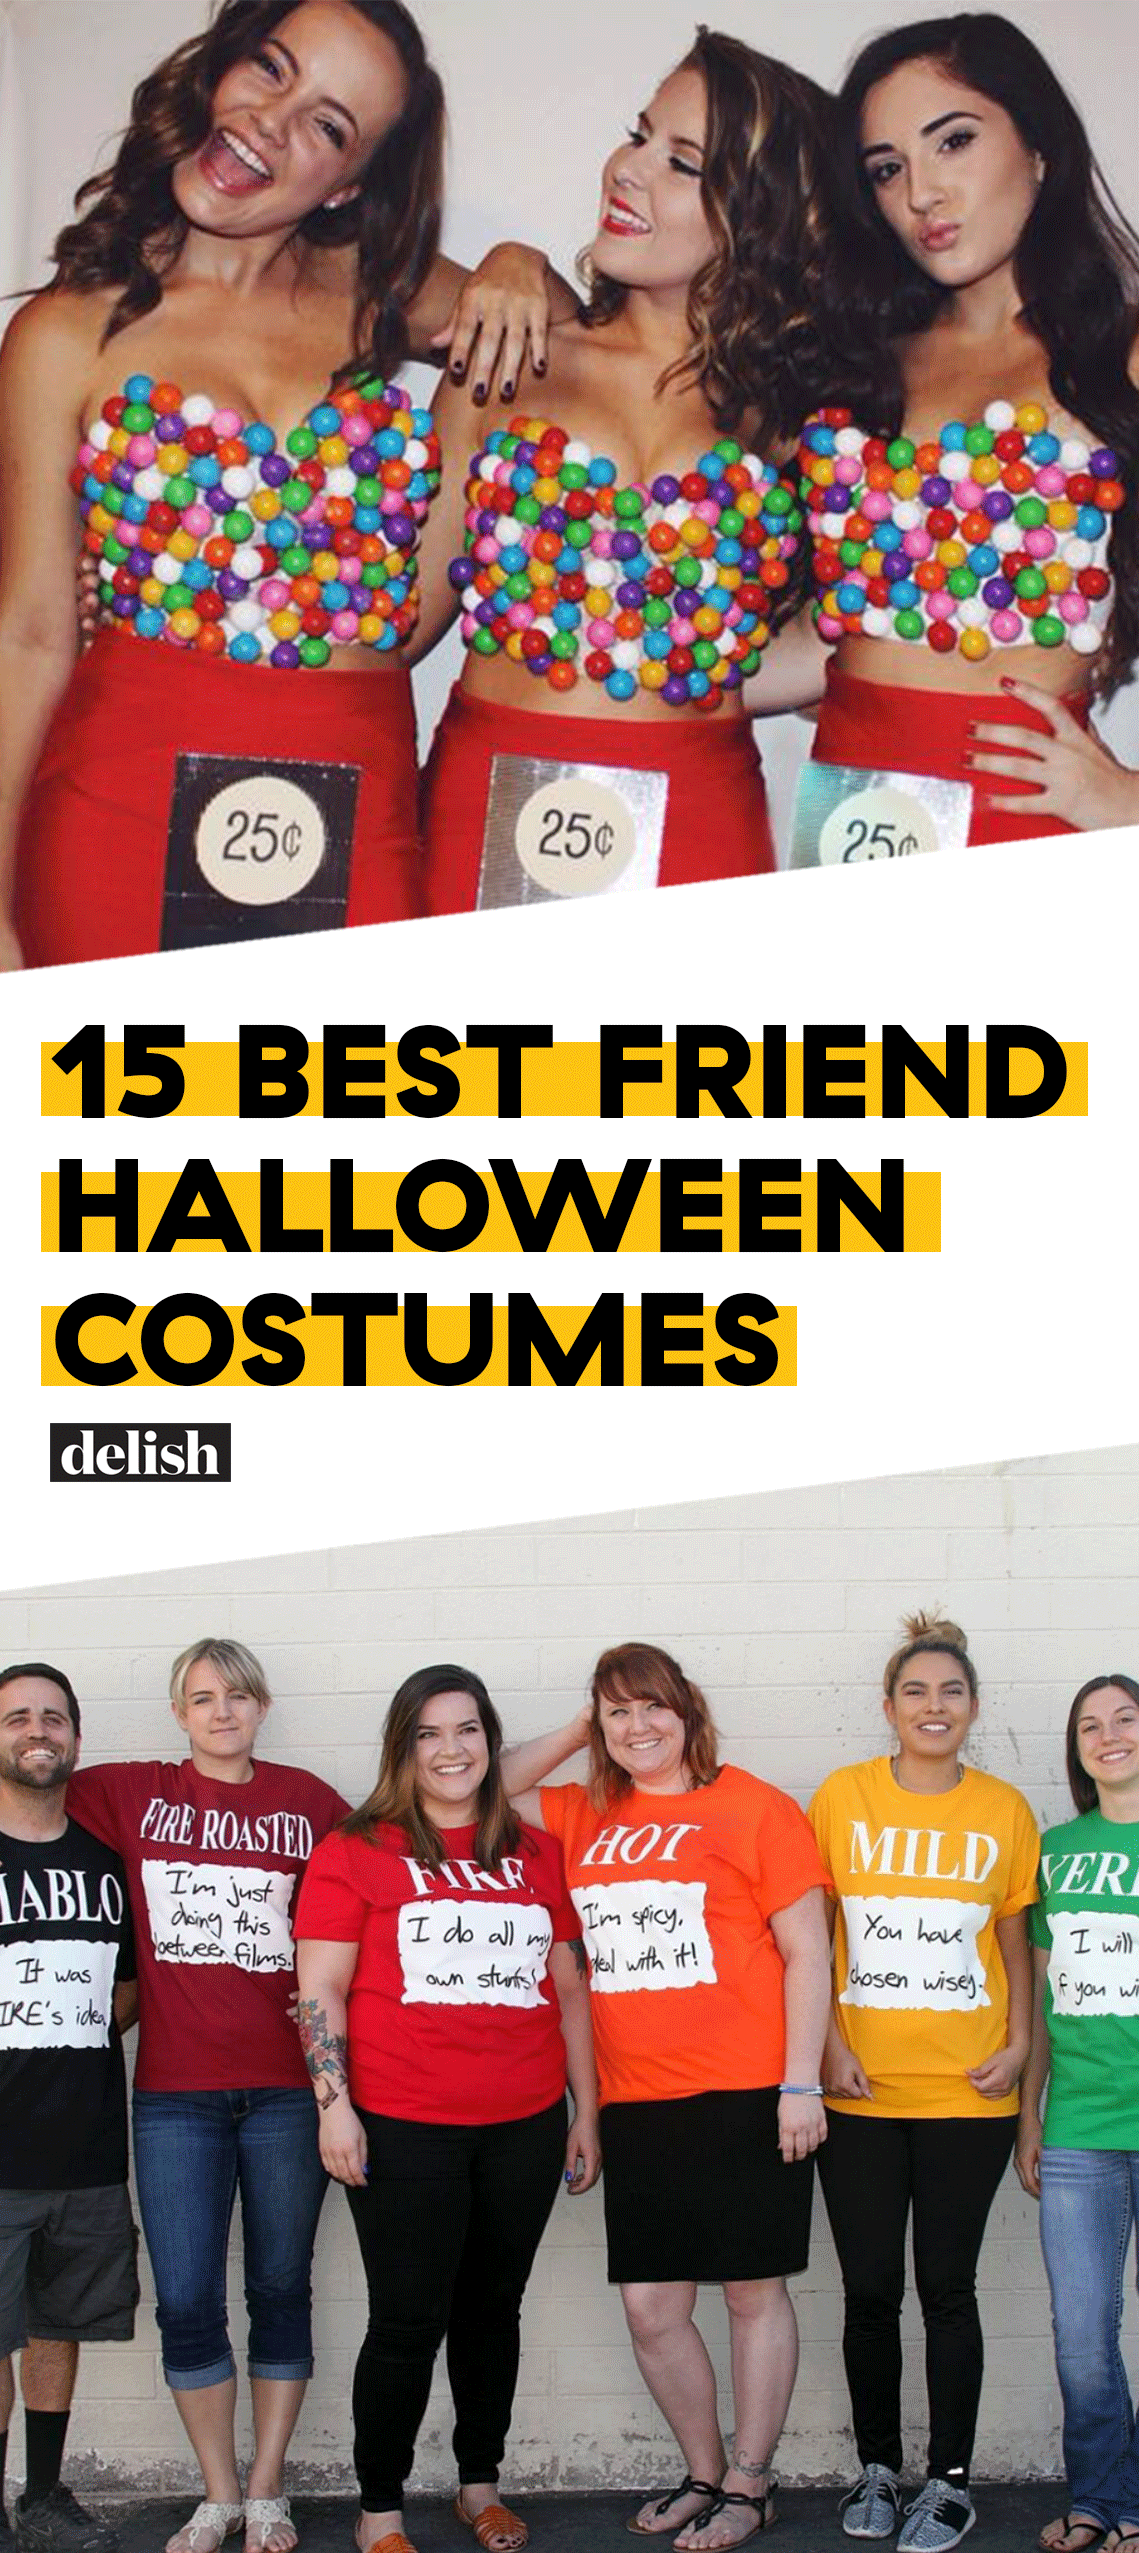 Jack & Coke Matching Halloween Costume Best friend